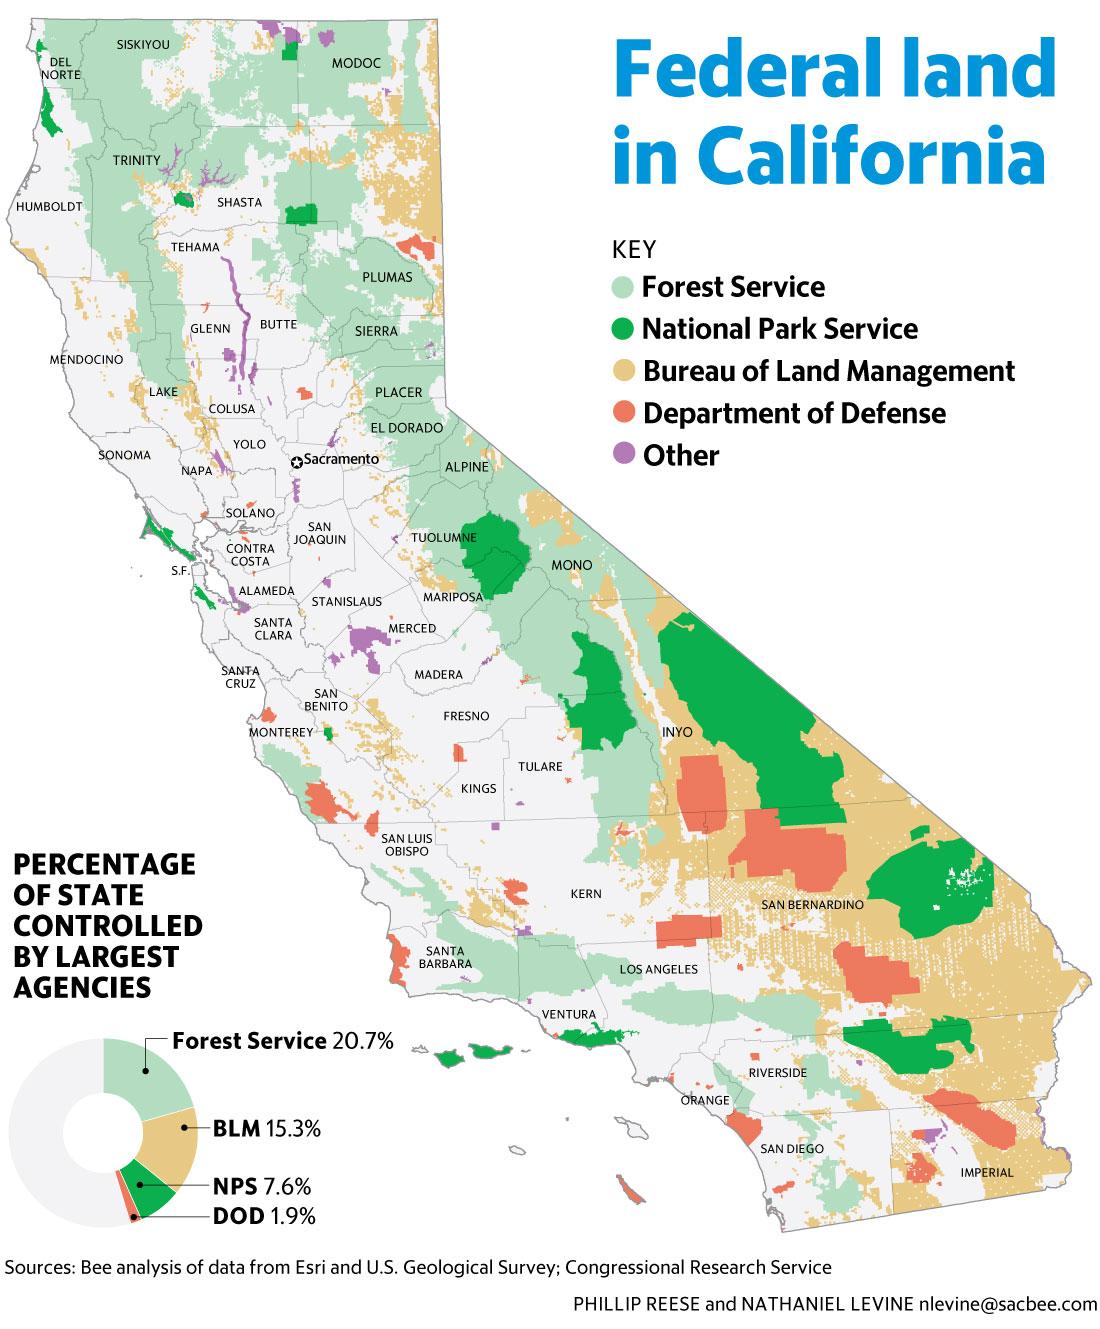 7 must-see Bureau of Land Management destinations in California   California  Sun